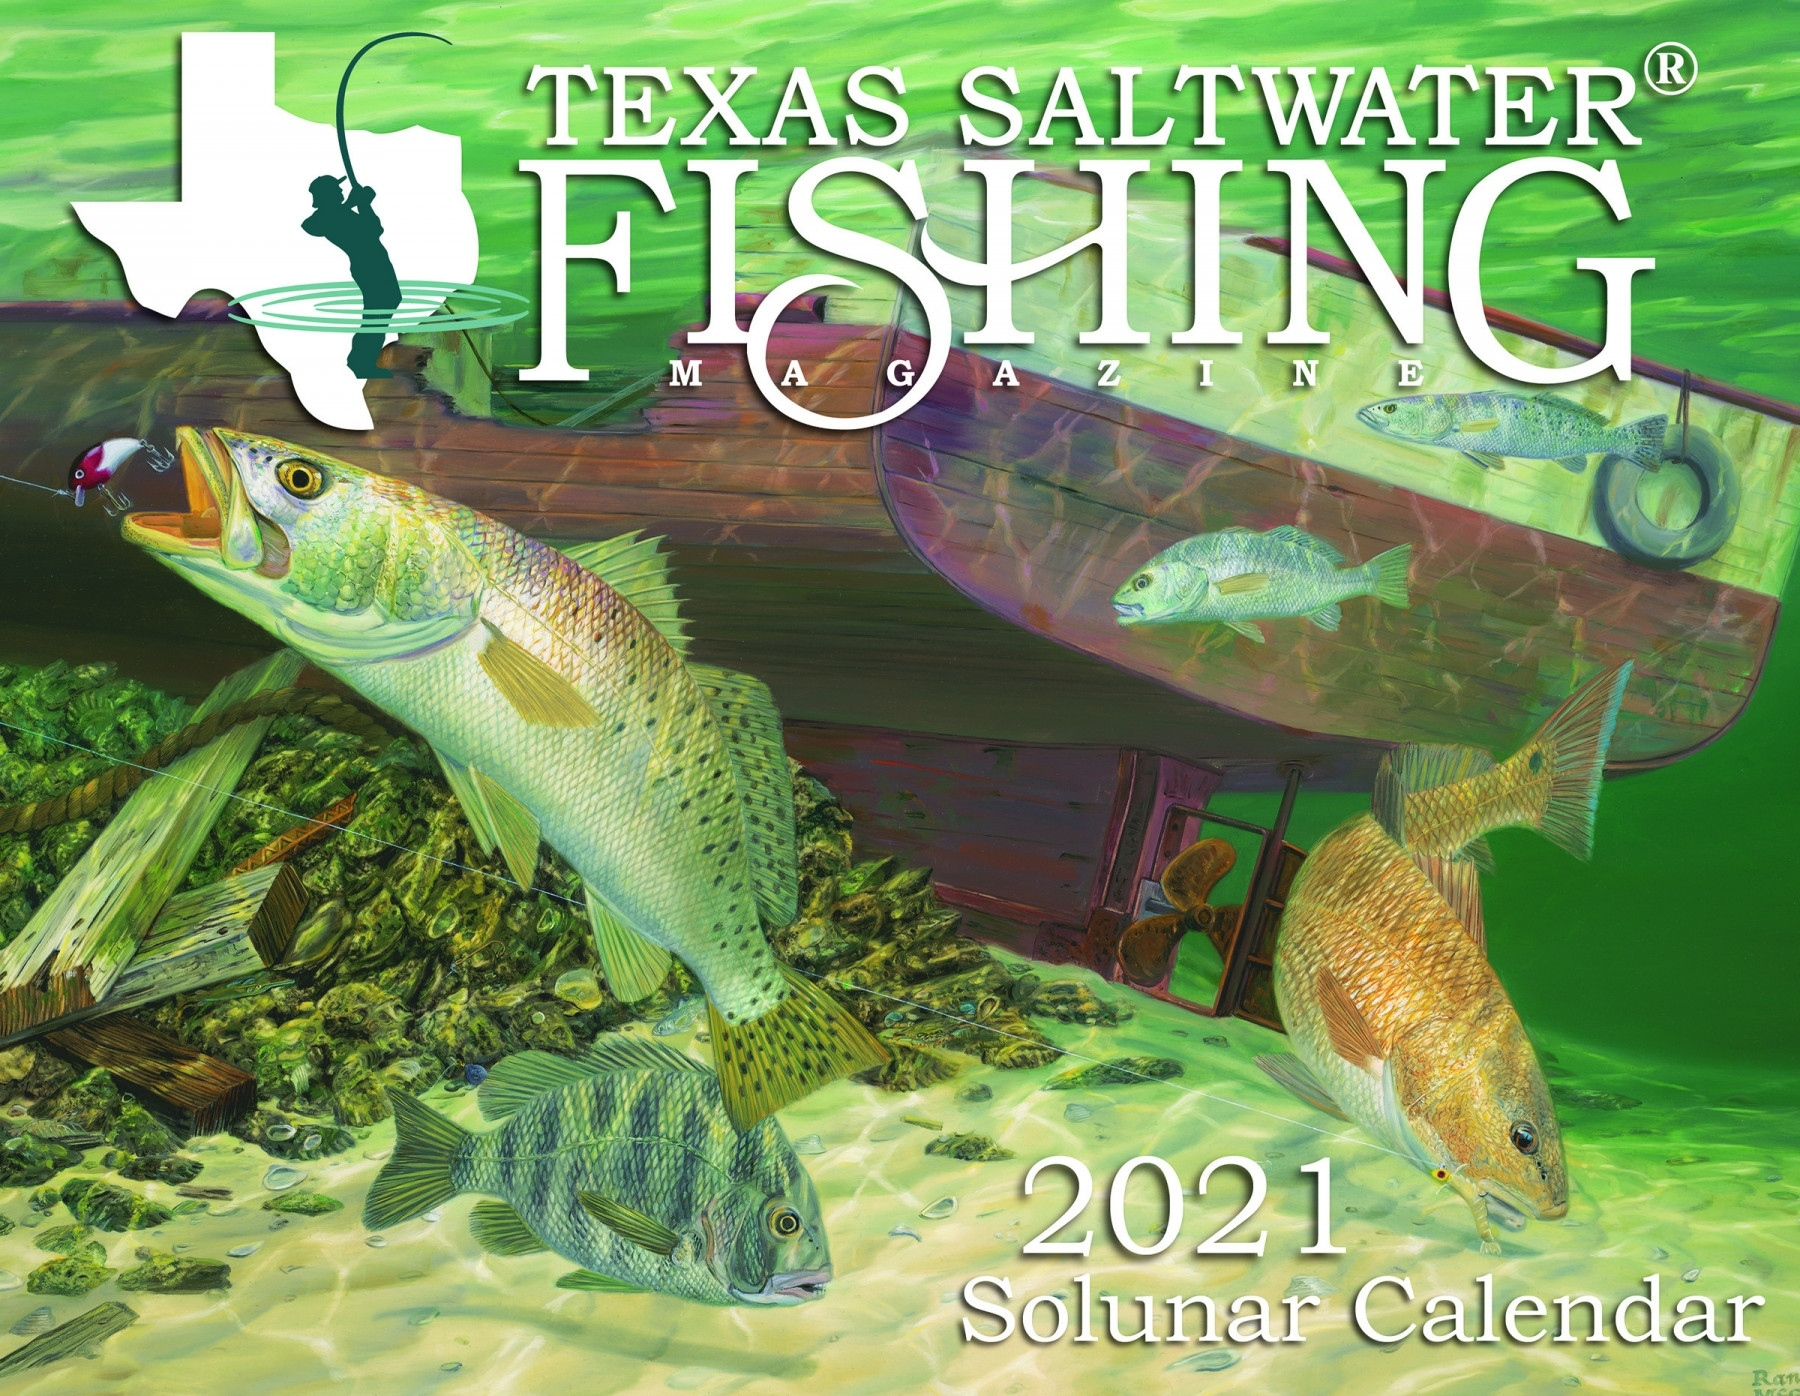 2021 Solunar Calendar - Texas Saltwater Fishing Magazine June 2021 Fishing Calendar